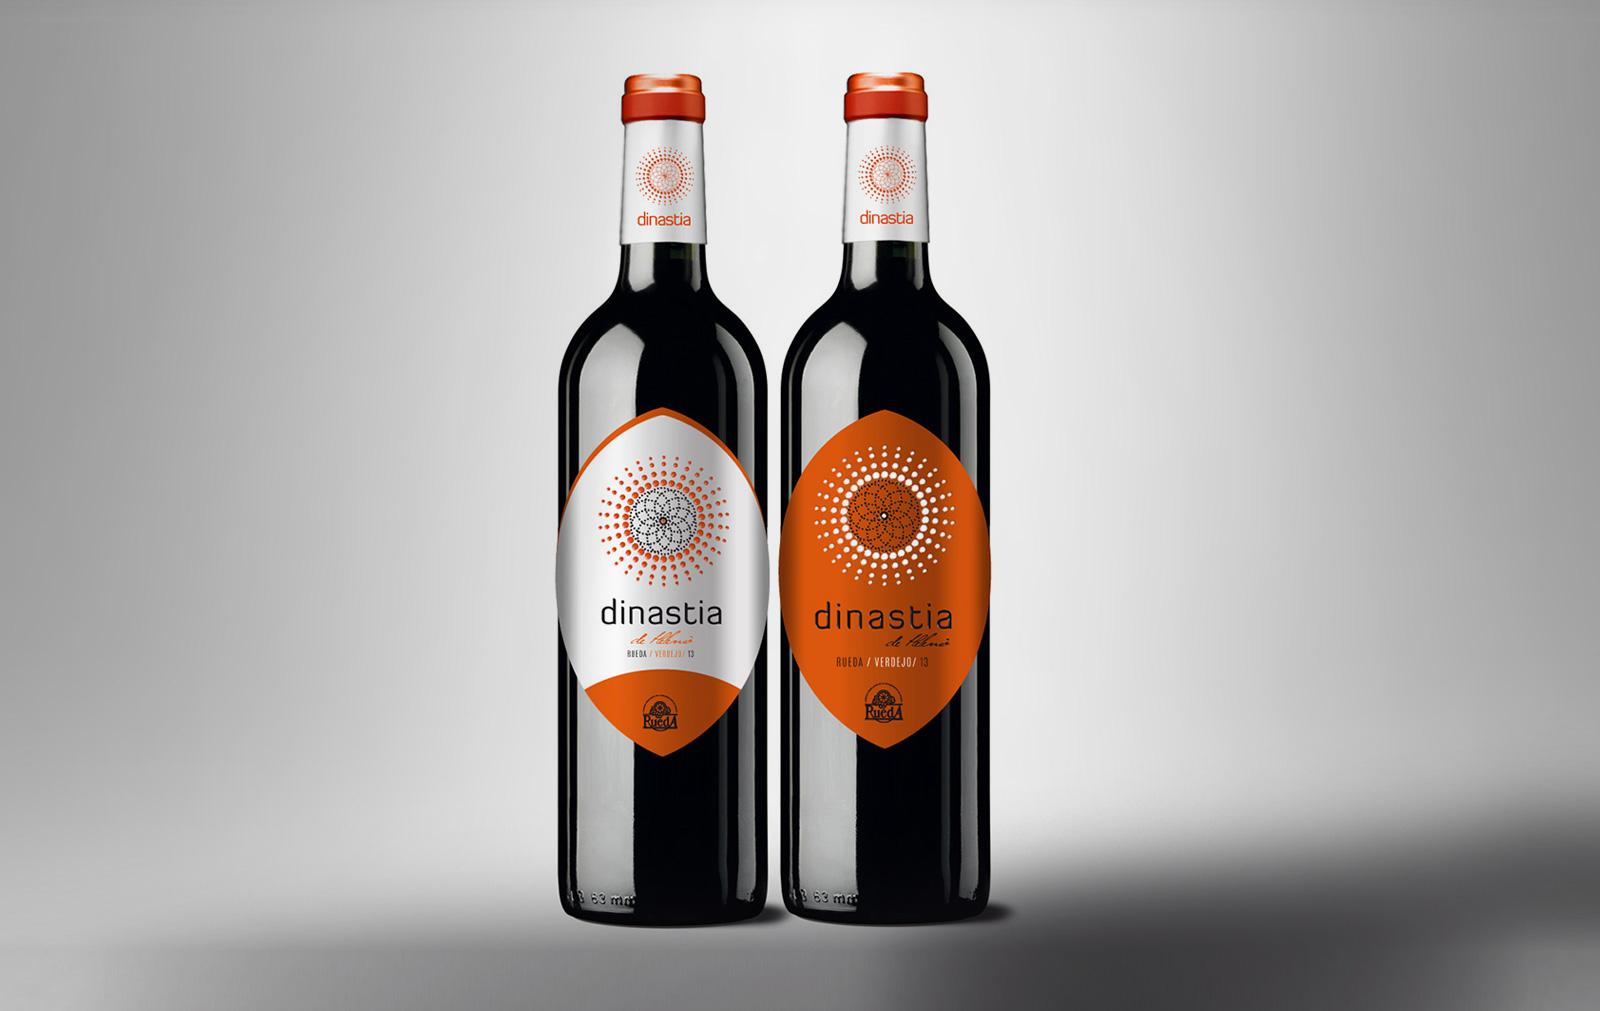 etiqueta_vino_verdejo_rueda20121